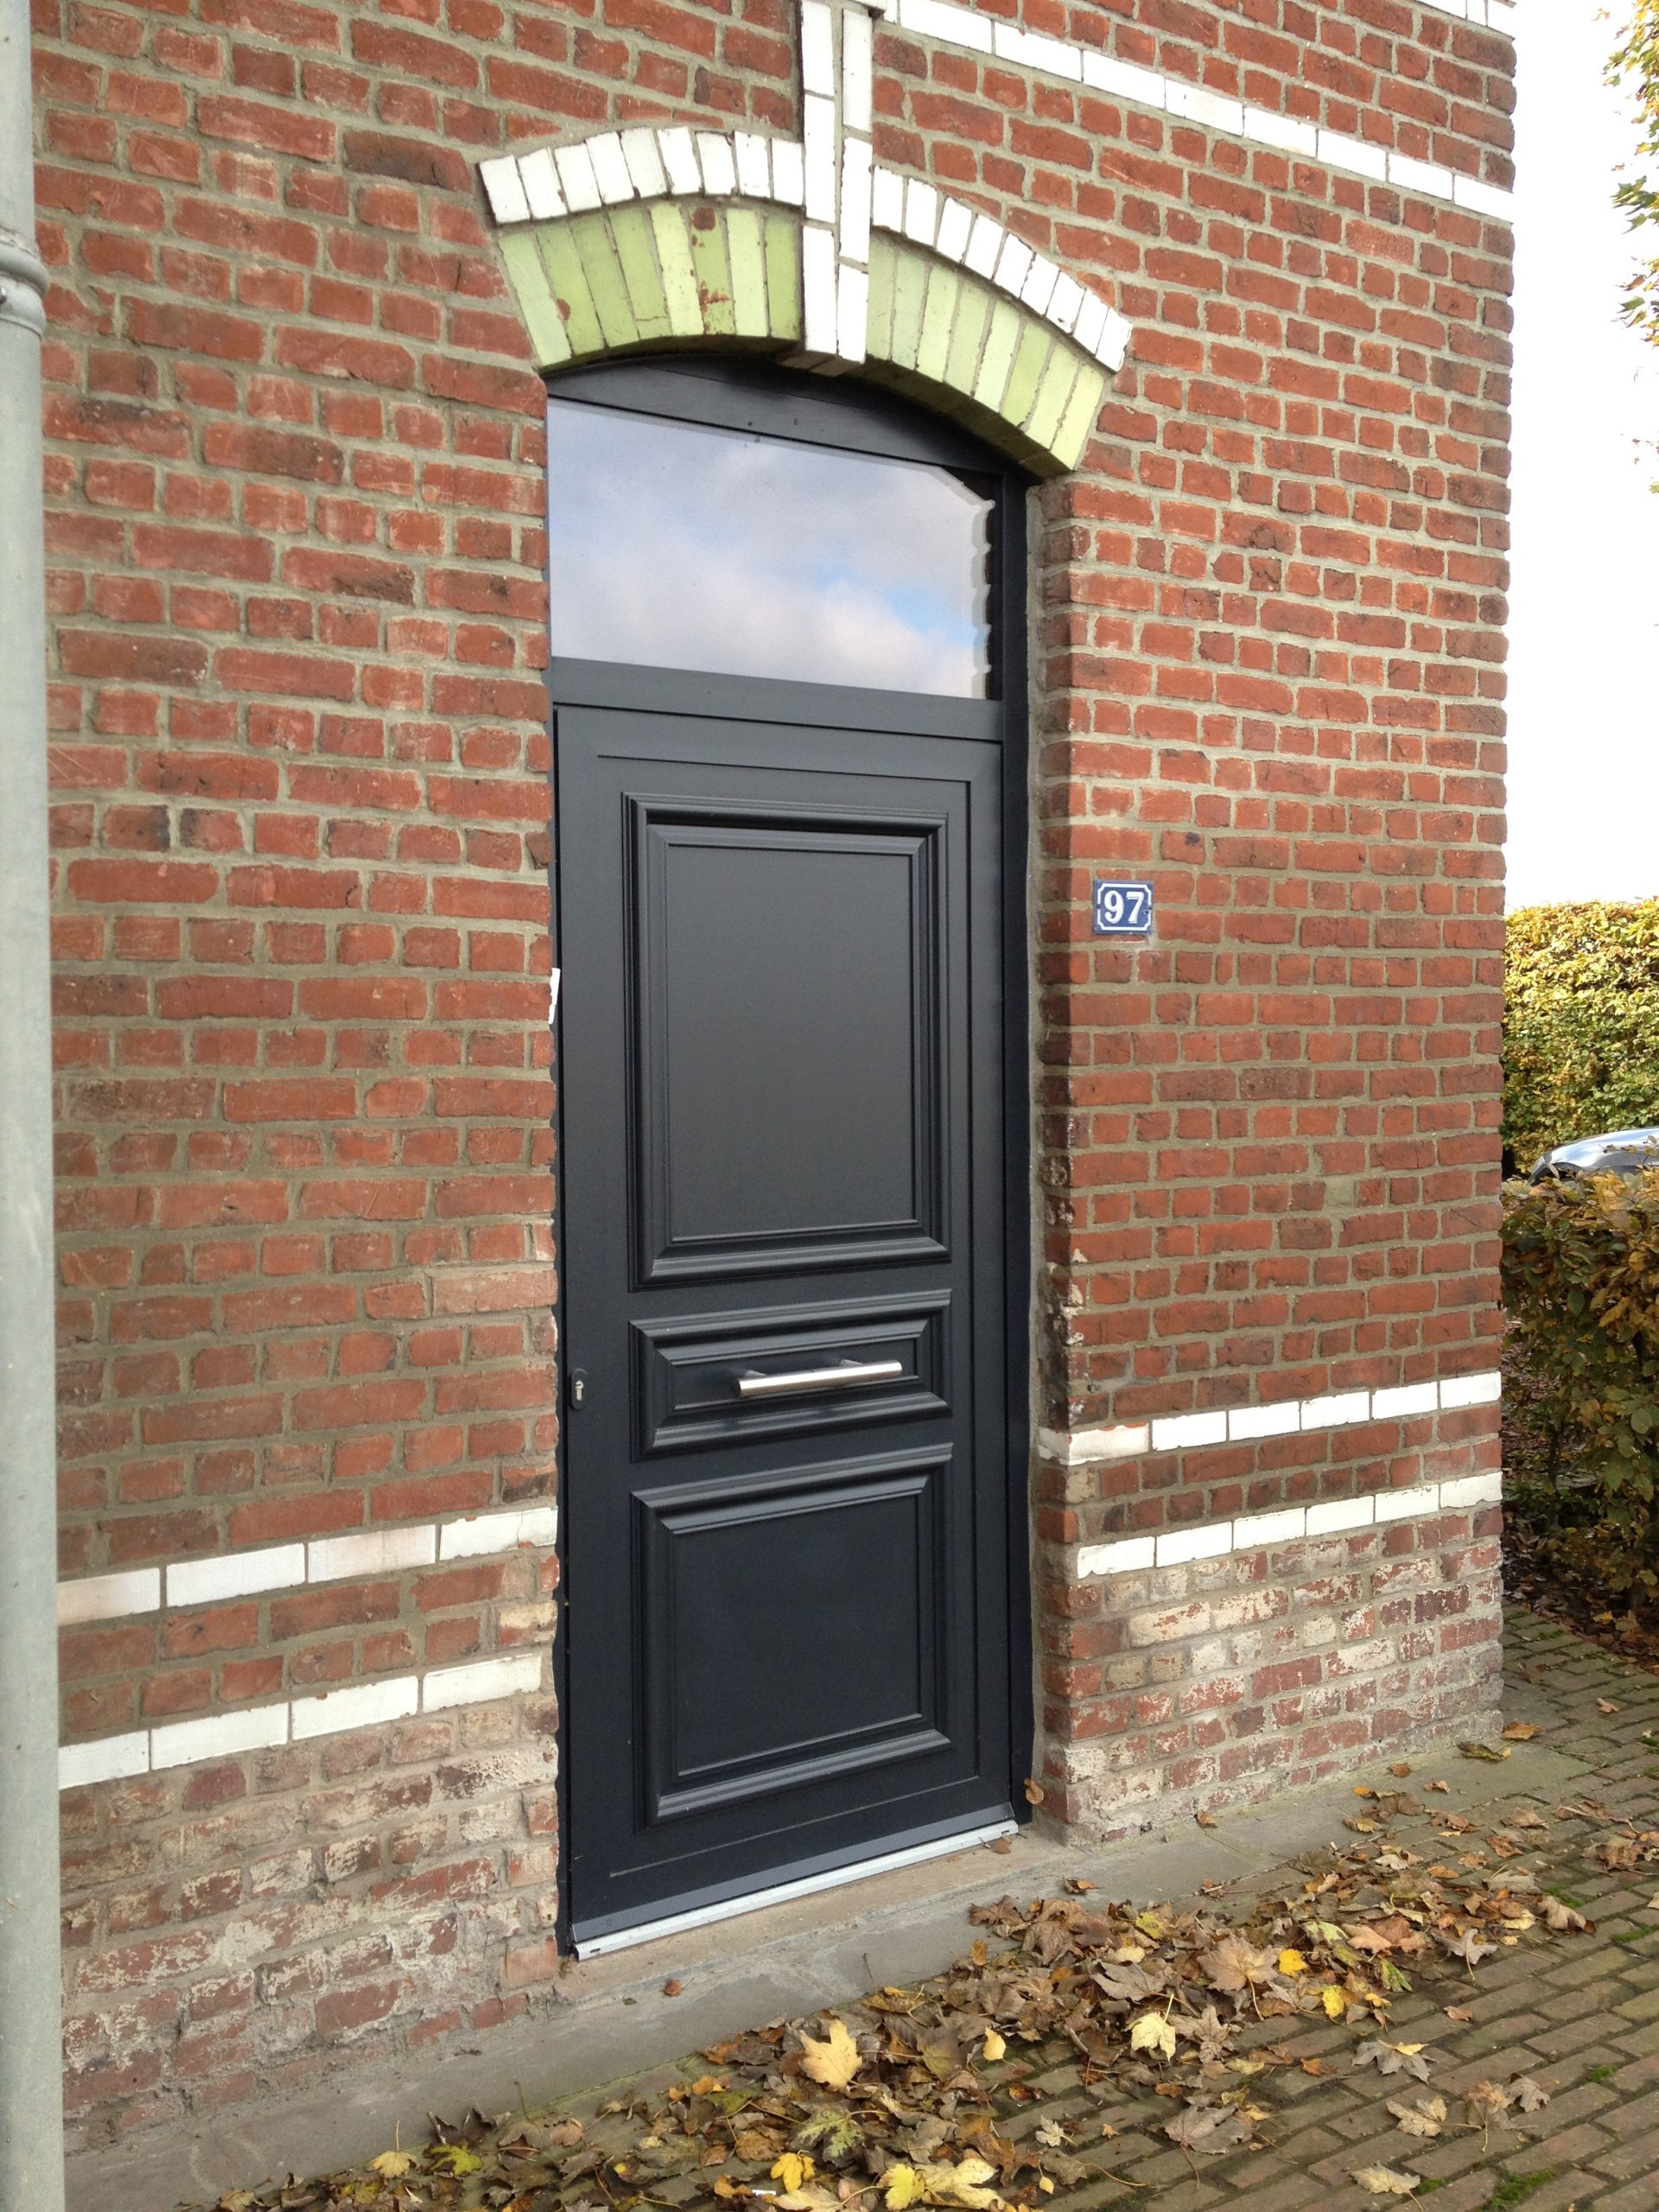 Porte aluminium Frager Fralu sur cadre Technal Soleal PY